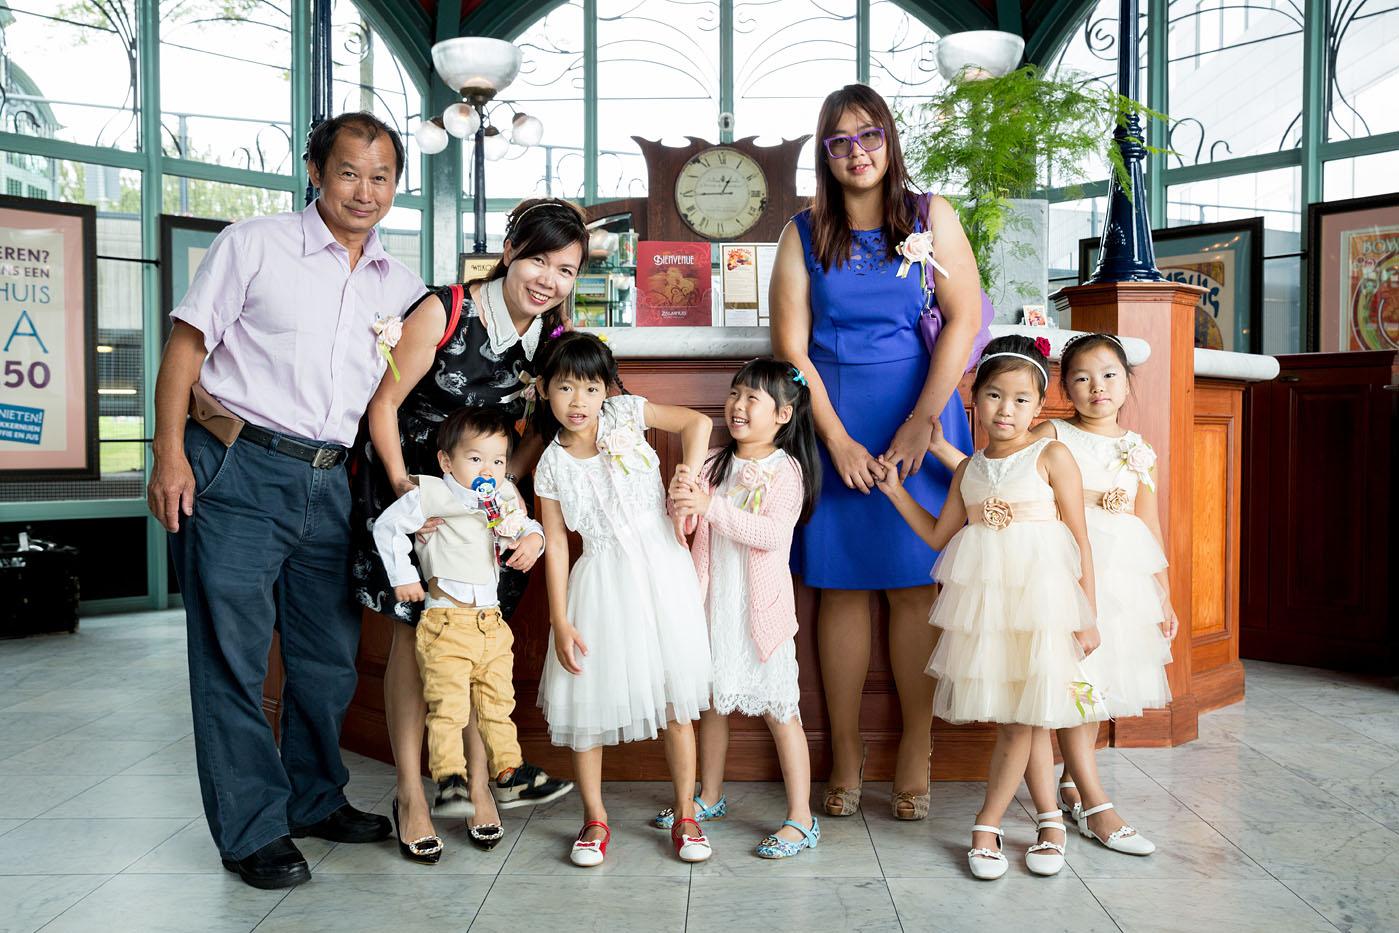 bruiloft-wedding-trouwen-fotograaf-chinees-bobhersbach-rotterdam-familie